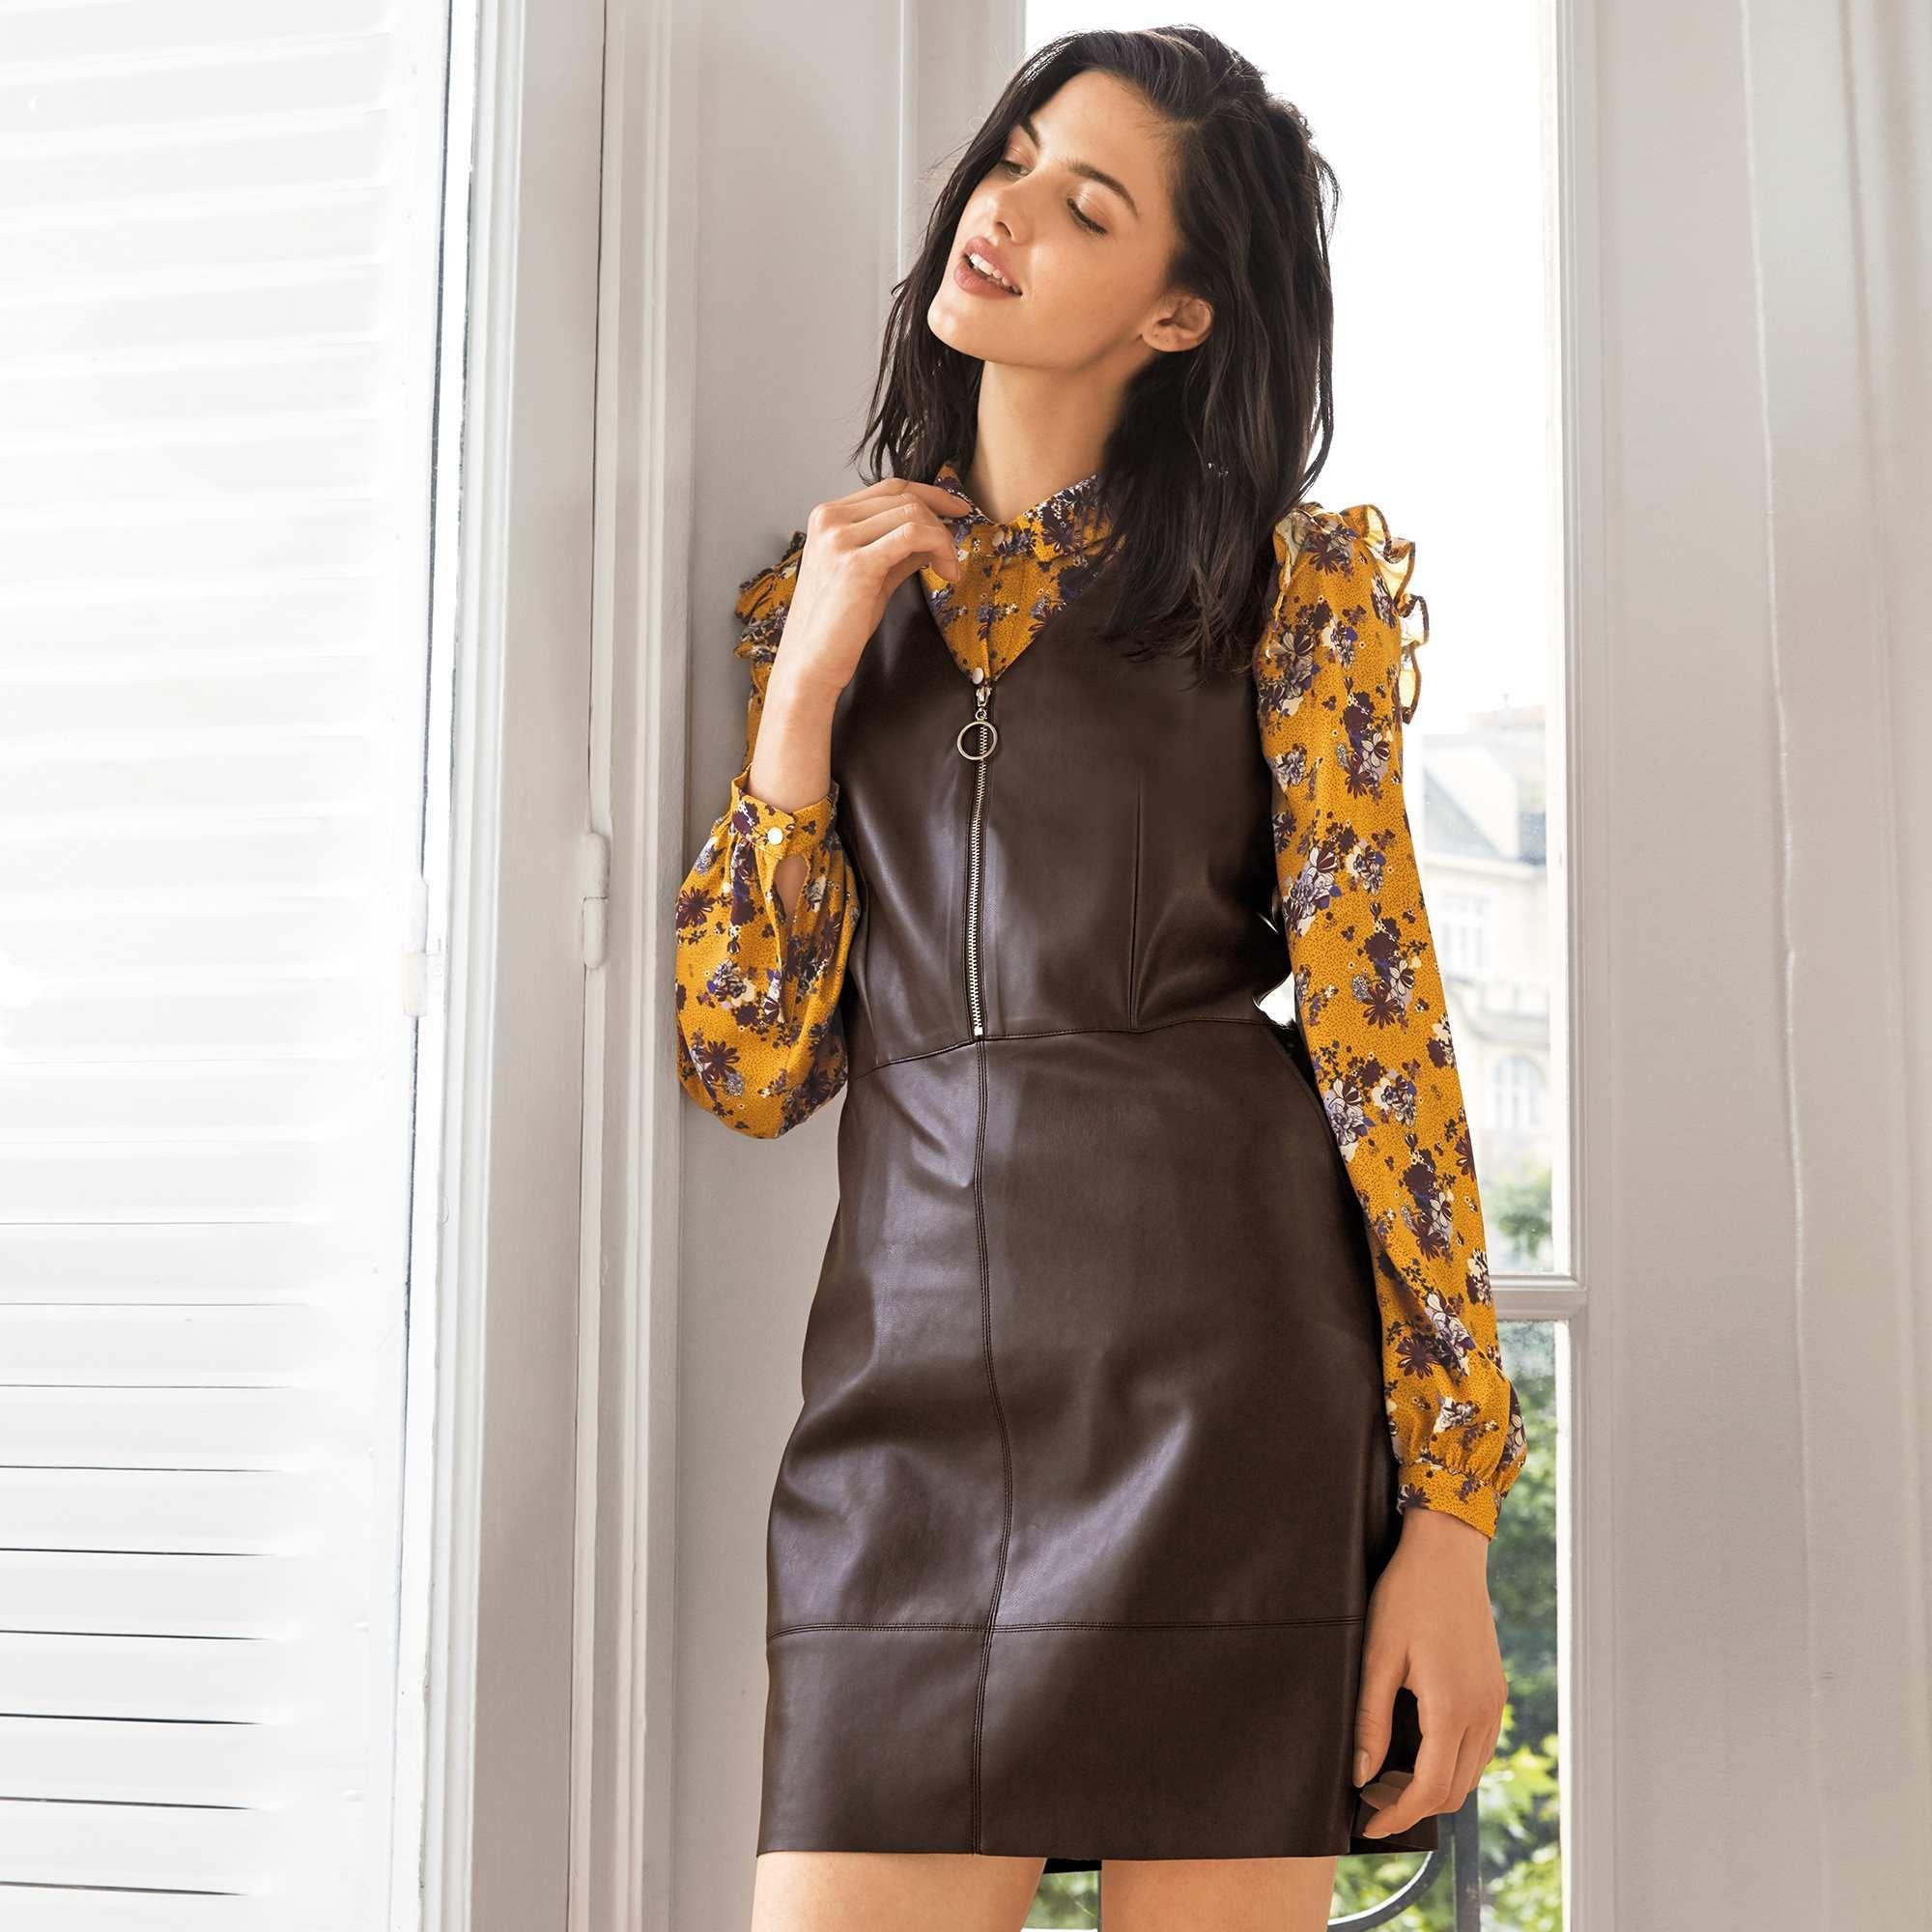 robe-sans-manches-en-simili-brun-femme-vx382_1_zc1